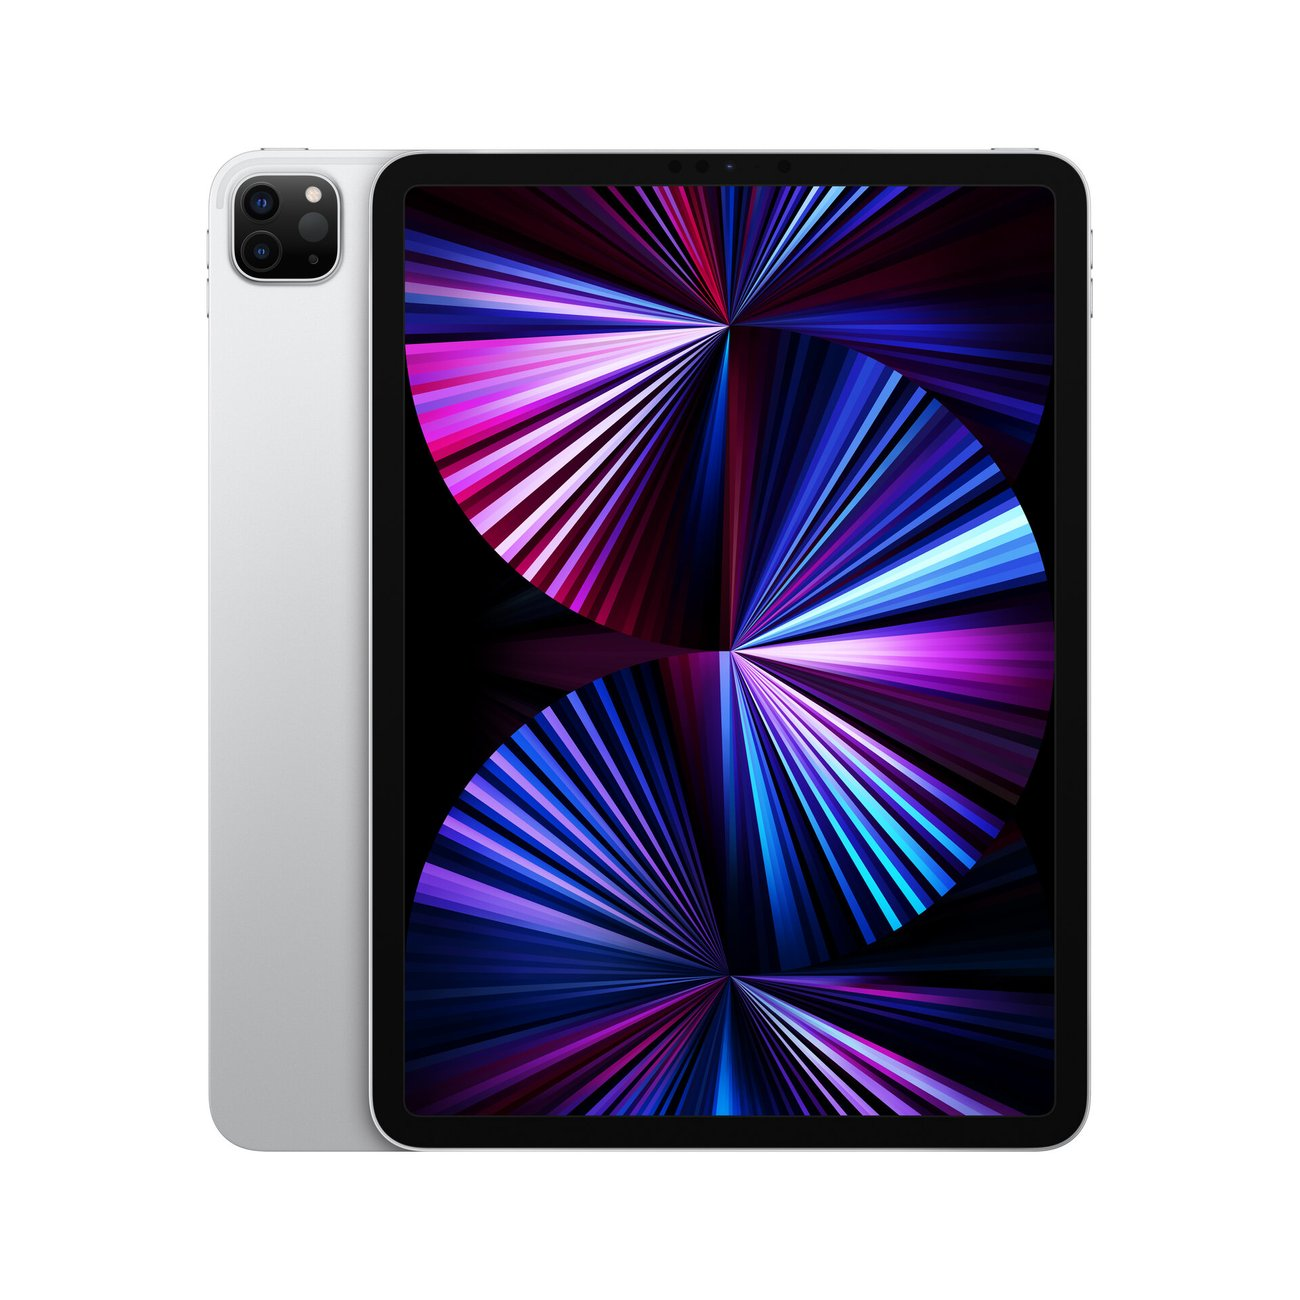 "Таблет Apple iPad Pro 12.9"" (5th) Cell 256GB Silver mhr73 , 256 GB, 8 GB"